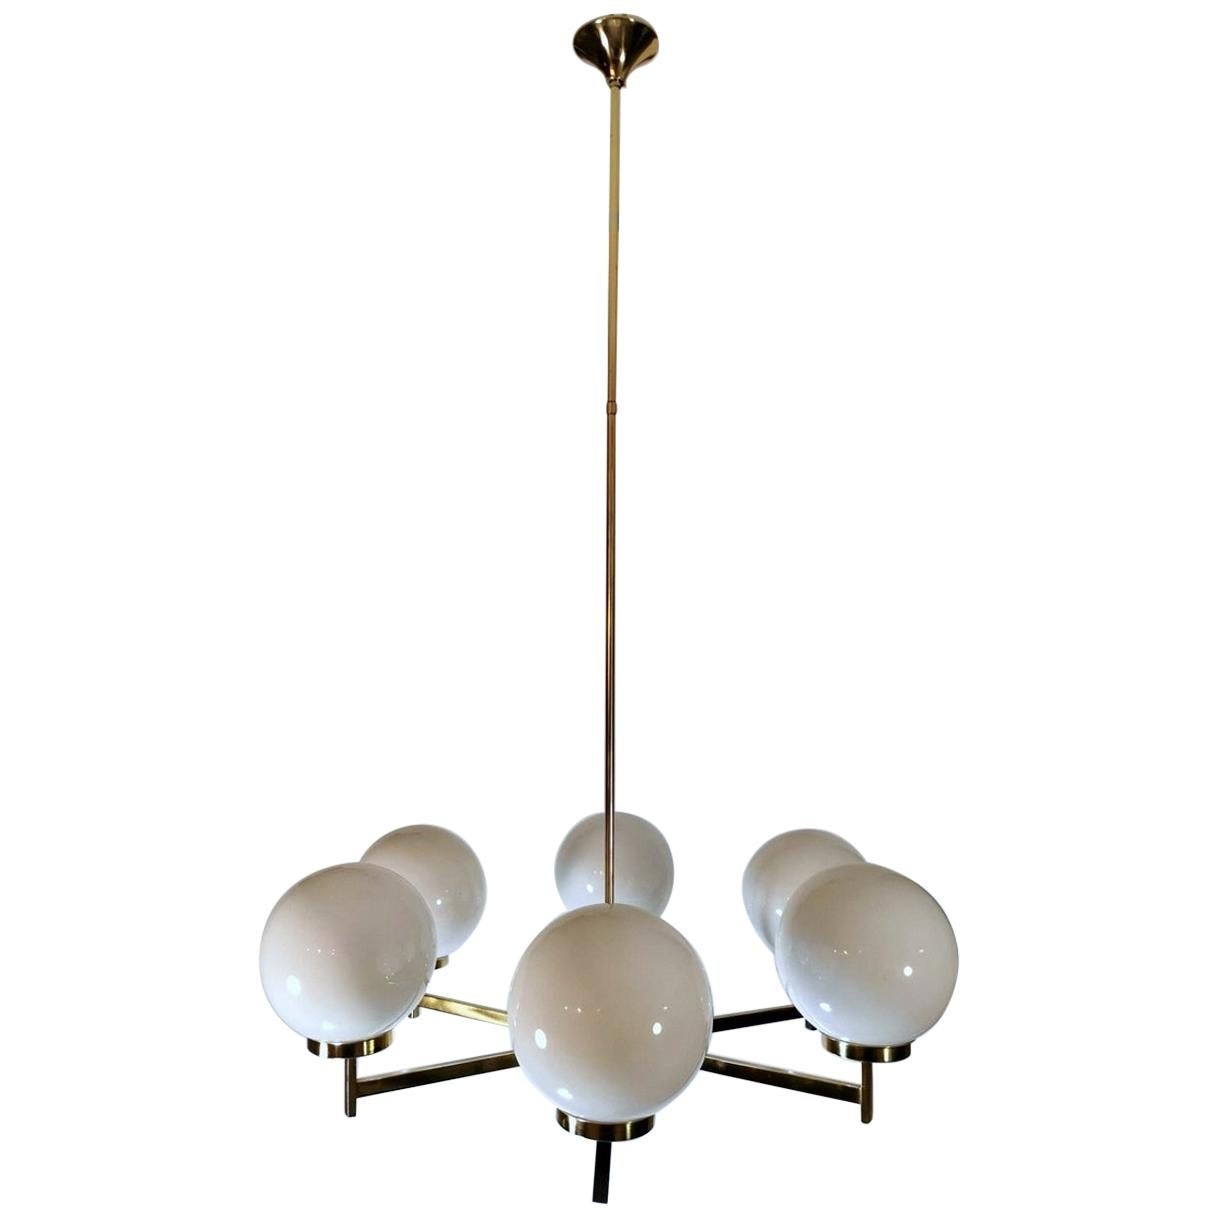 Stilnovo Italian Vintage Brass Chandelier, Opaline Glass Spheres